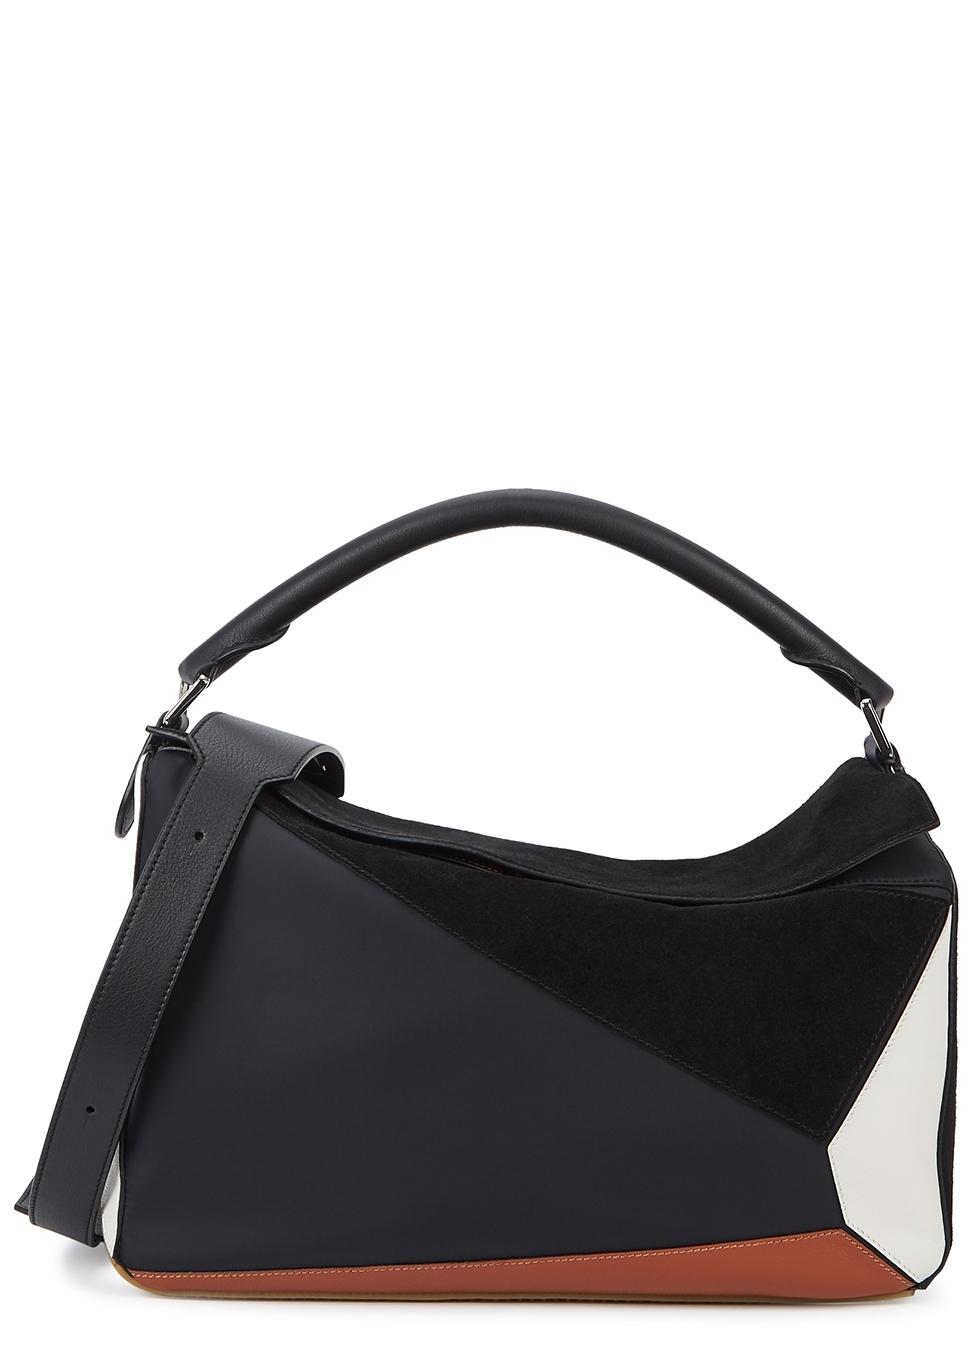 3e4d4e75e Men's Designer Bags - Bags For Men - Harvey Nichols